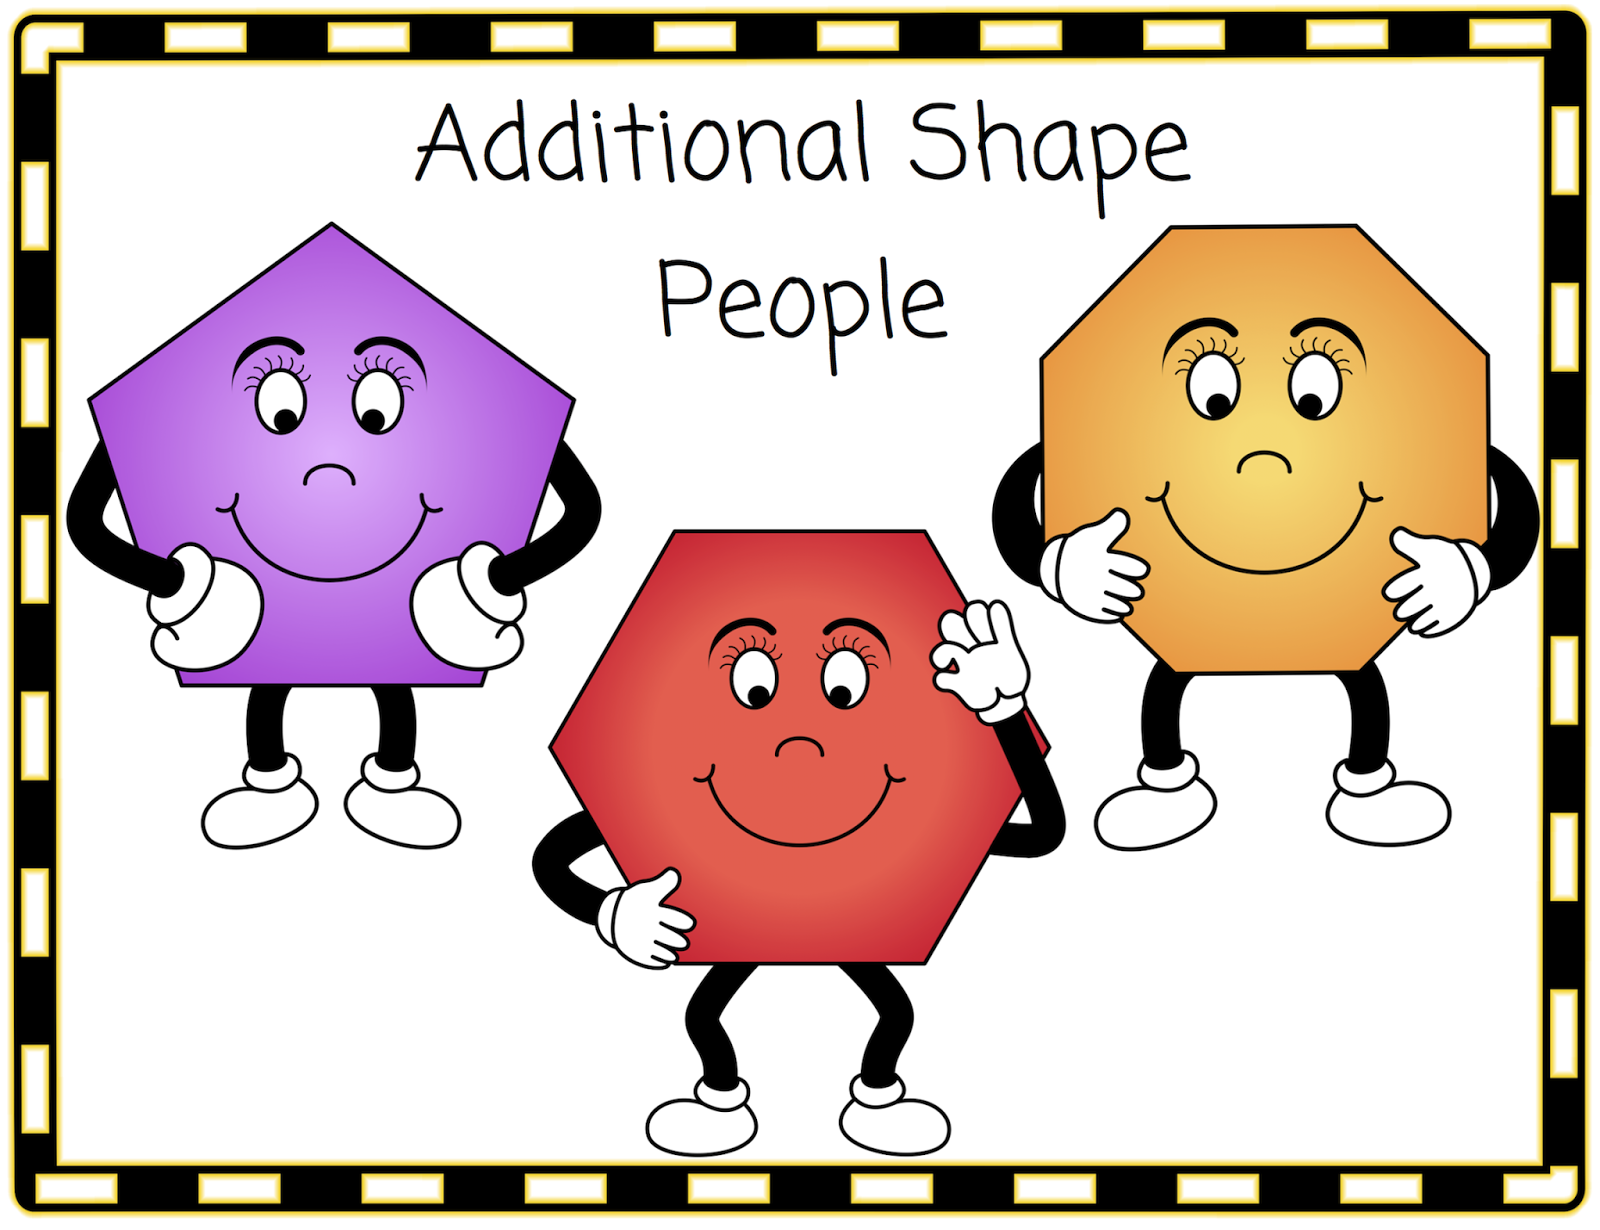 Three Additional Shape People